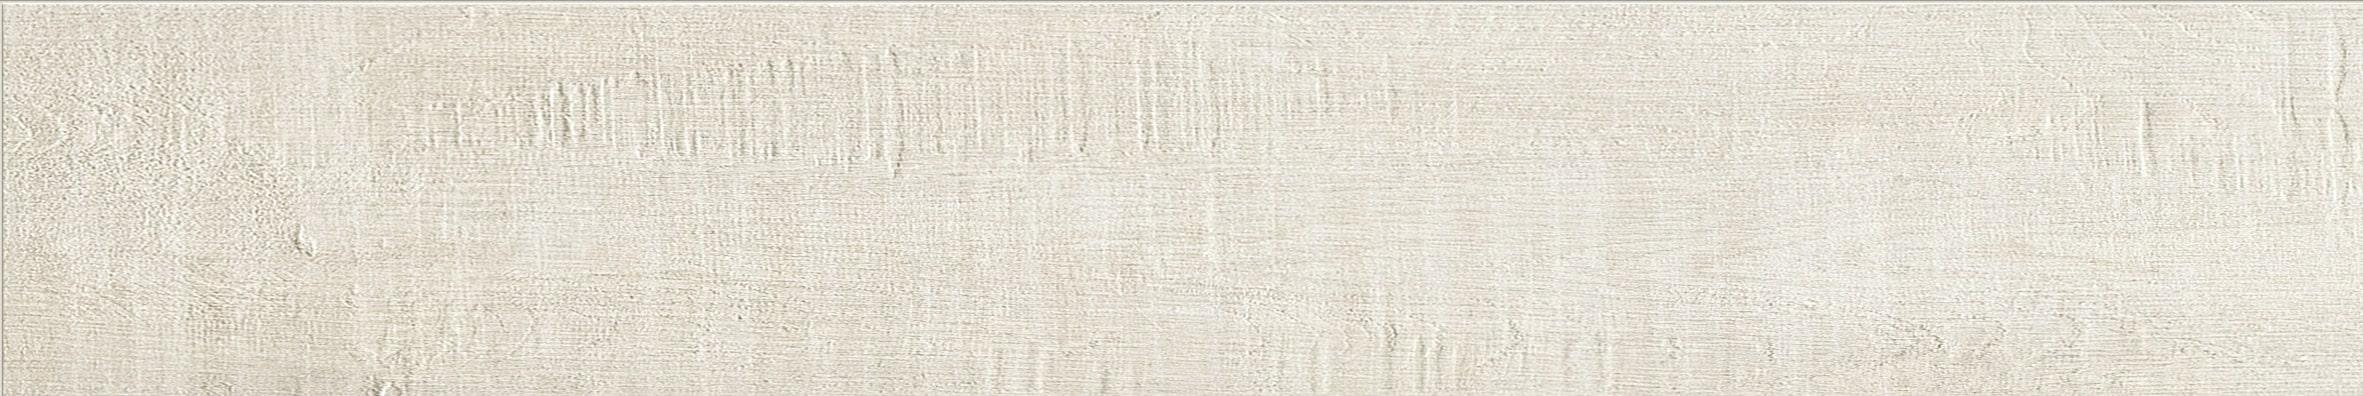 Wooden Tile / Wooden White Matte 10mm 20 x 120